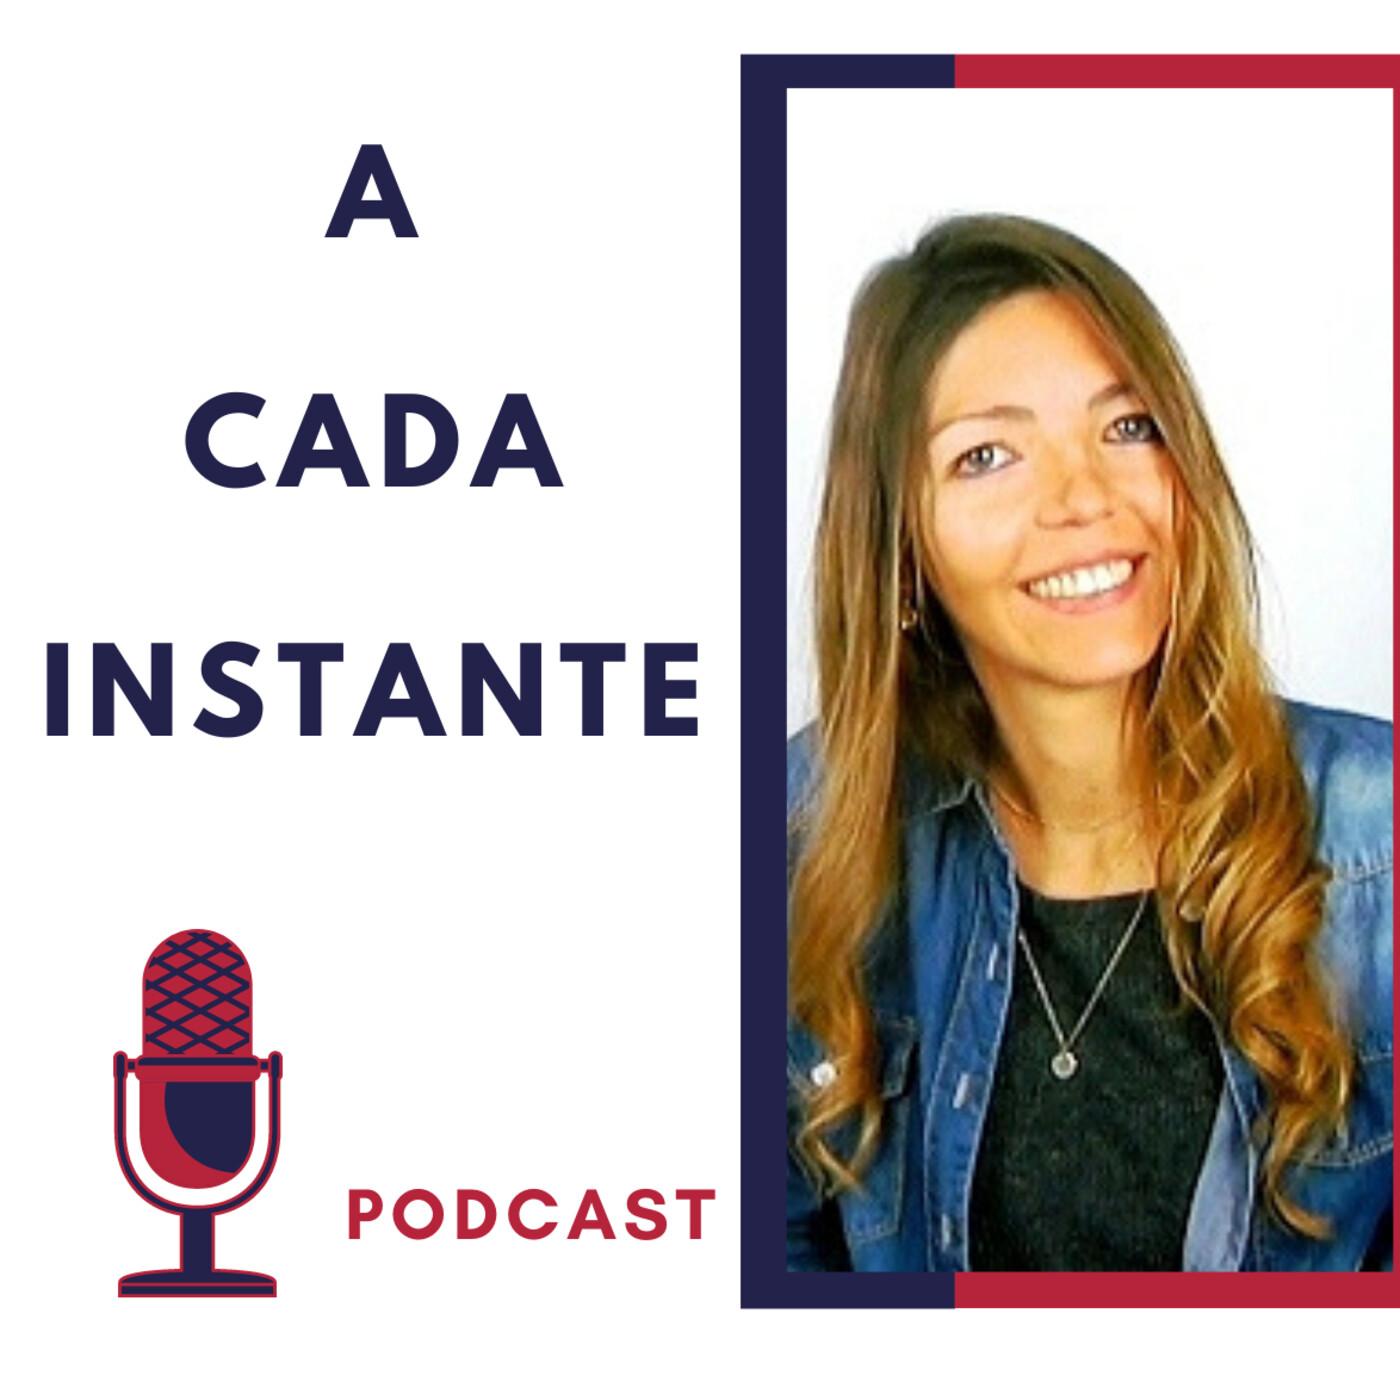 Cómo Calmar Tu Mente - 3 Ideas Prácticas - Mindfulness